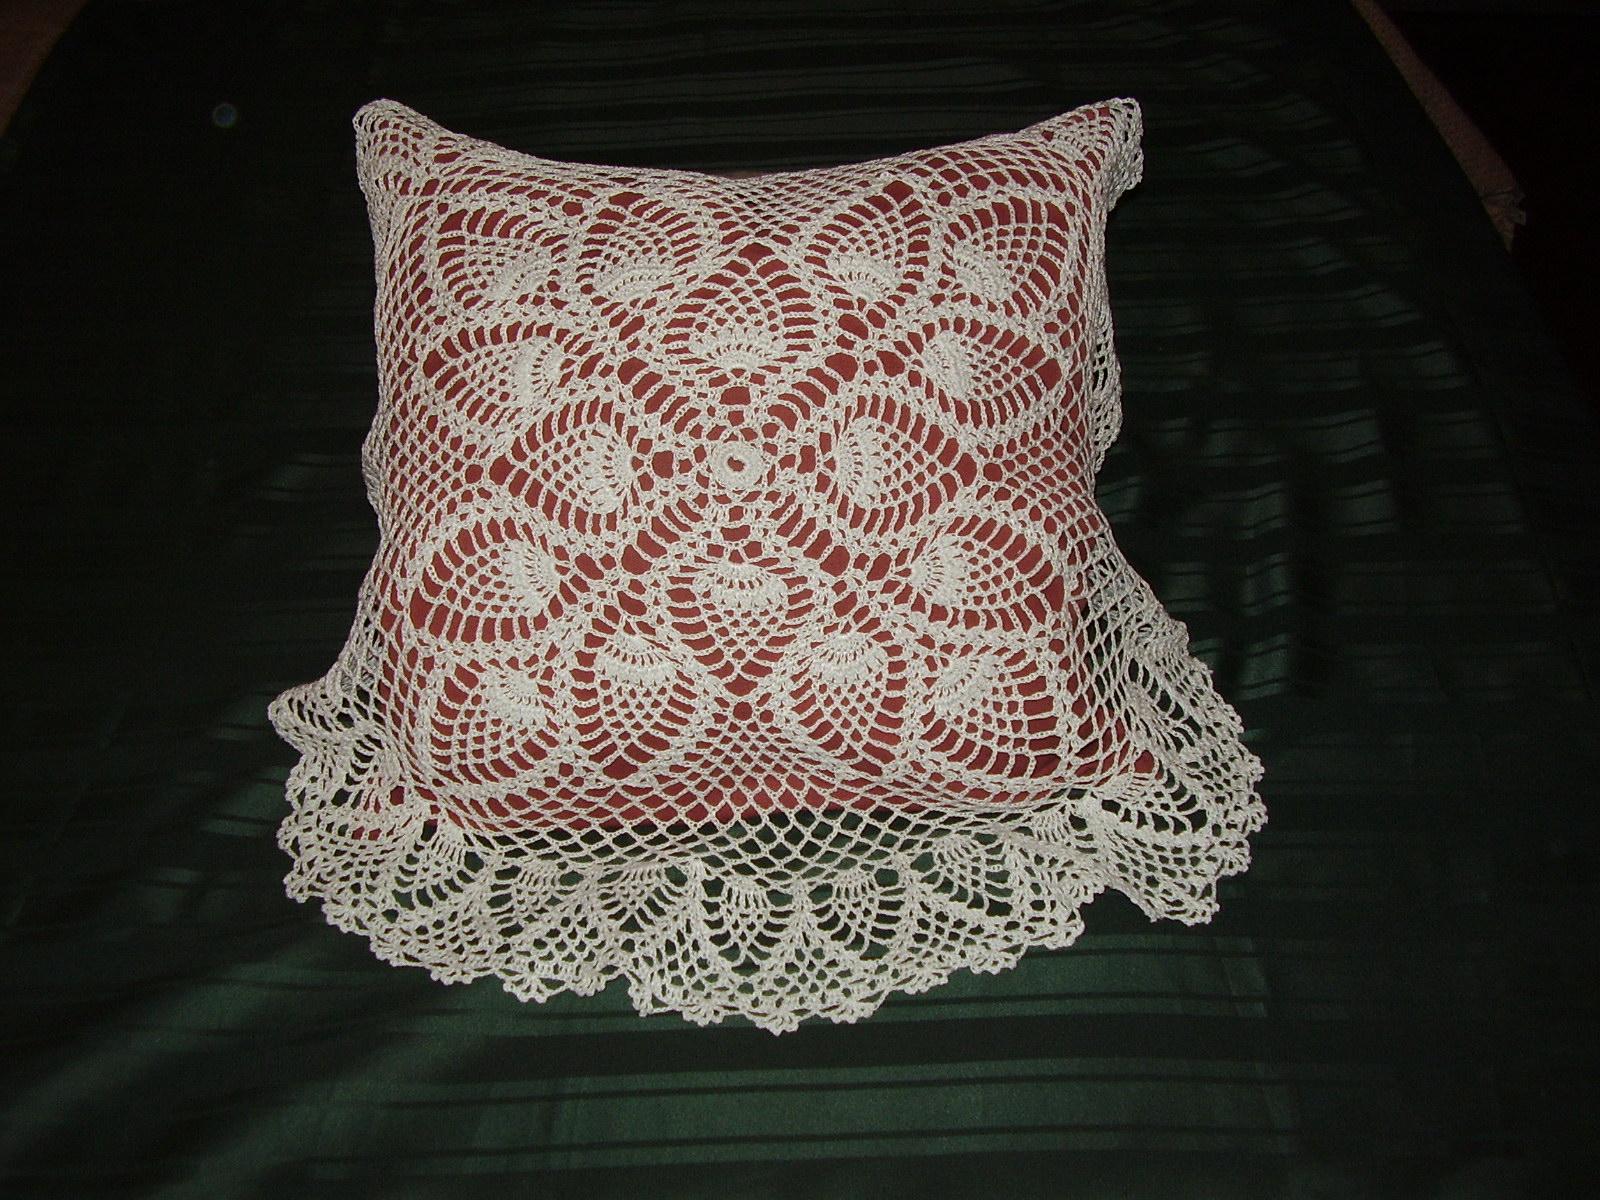 Pin Cojines Tejidos A Crochet O Ganchillo Com Portal Pelautscom on